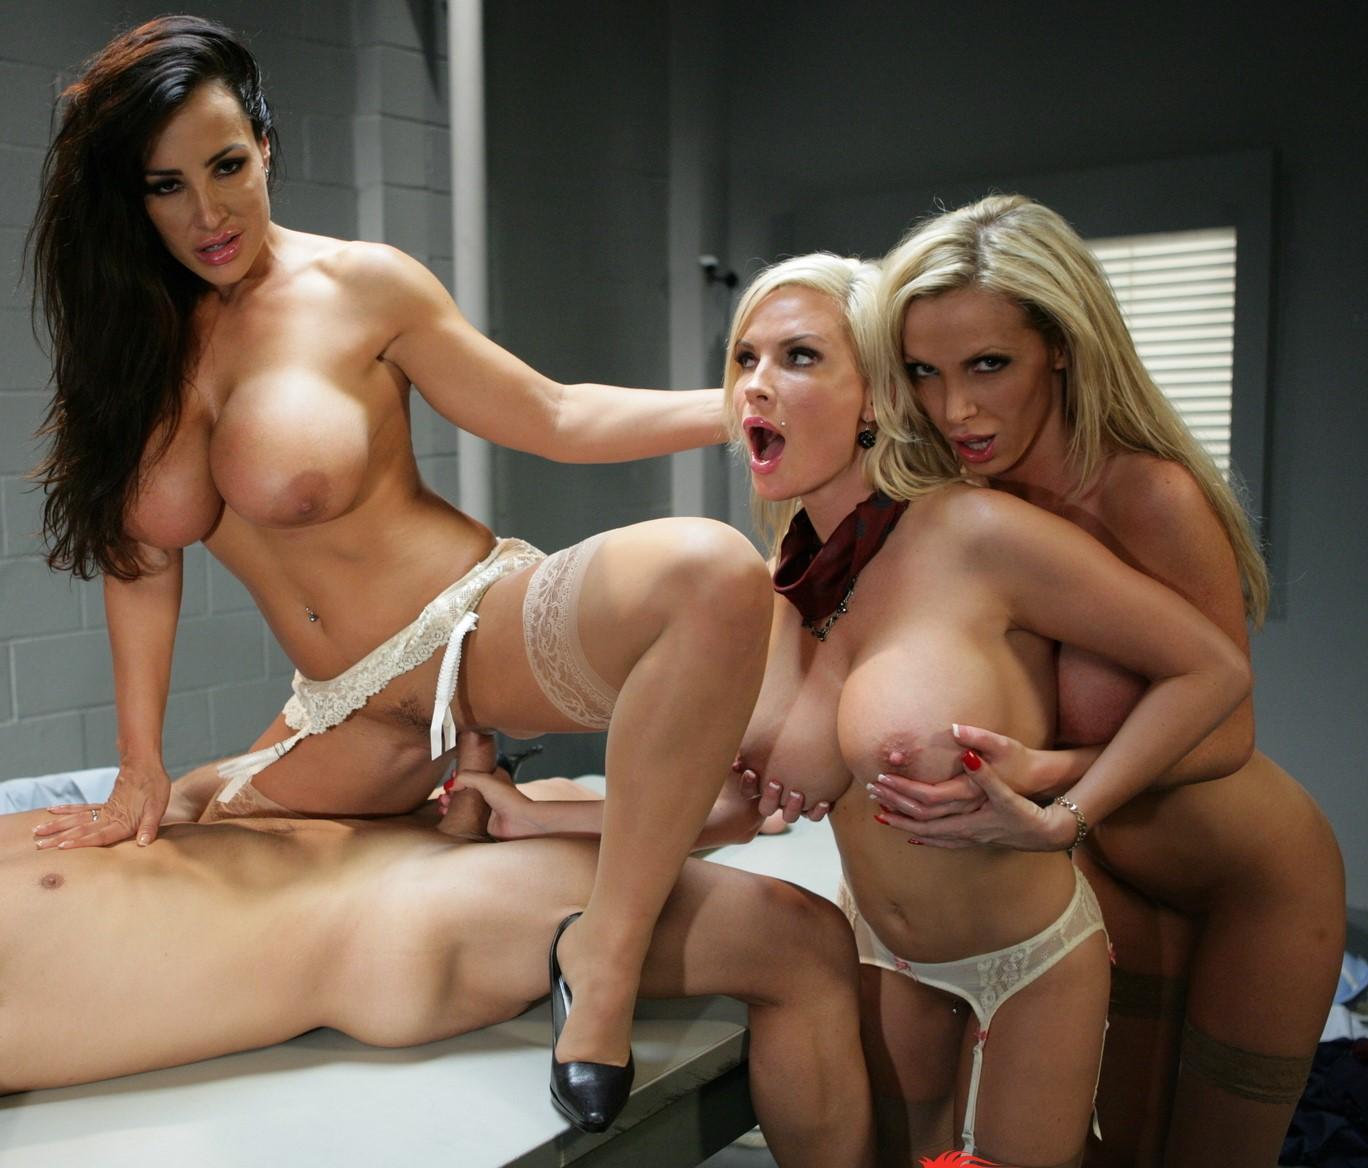 Nikki Sexx's Blog